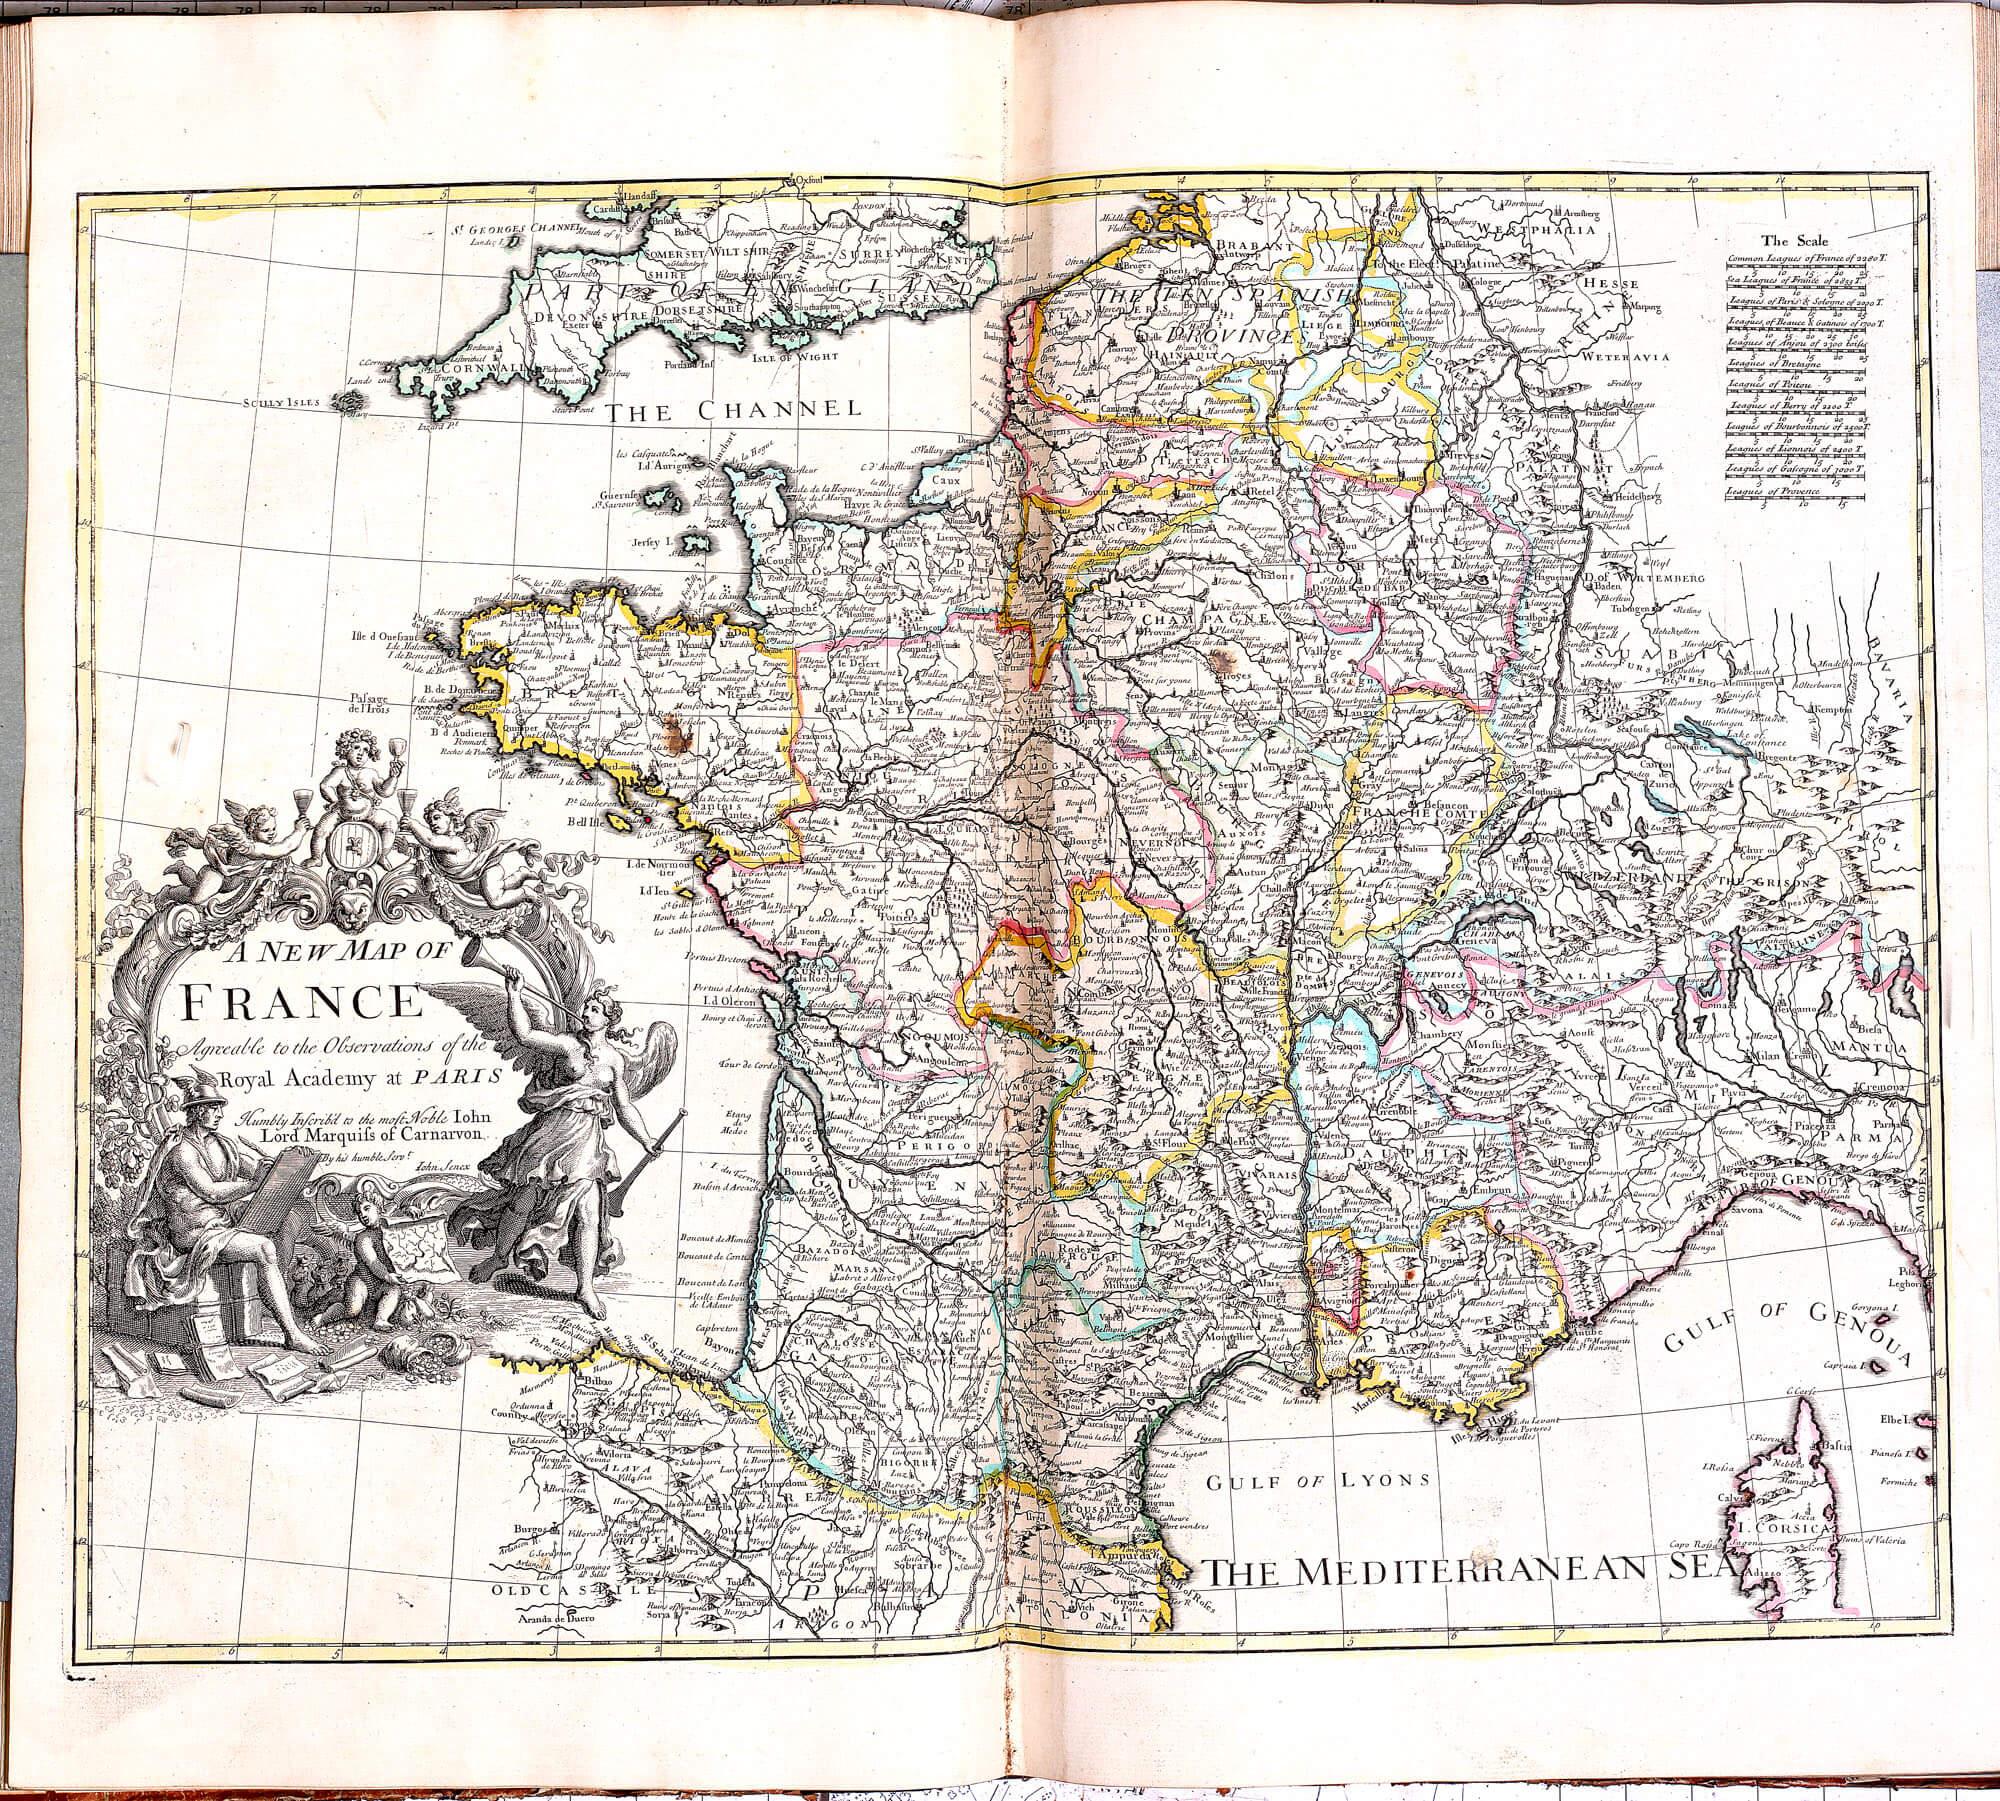 World atlas john senex 1721 l brown collection pp a 15 12 france post routes gumiabroncs Choice Image